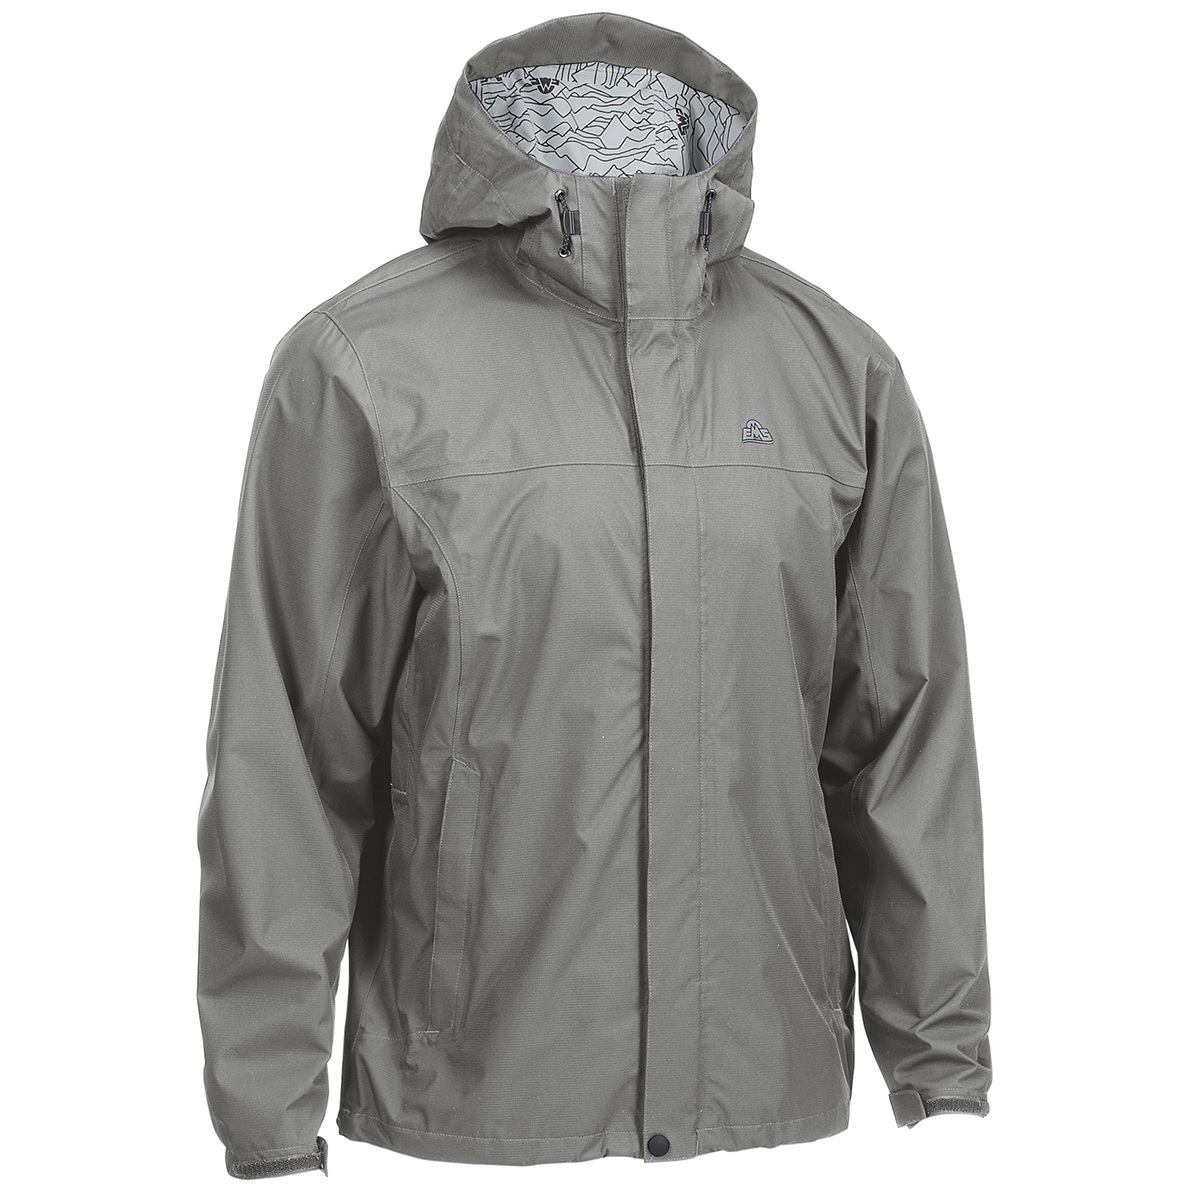 Ems Men's Thunderhead Peak Rain Jacket - Black, M